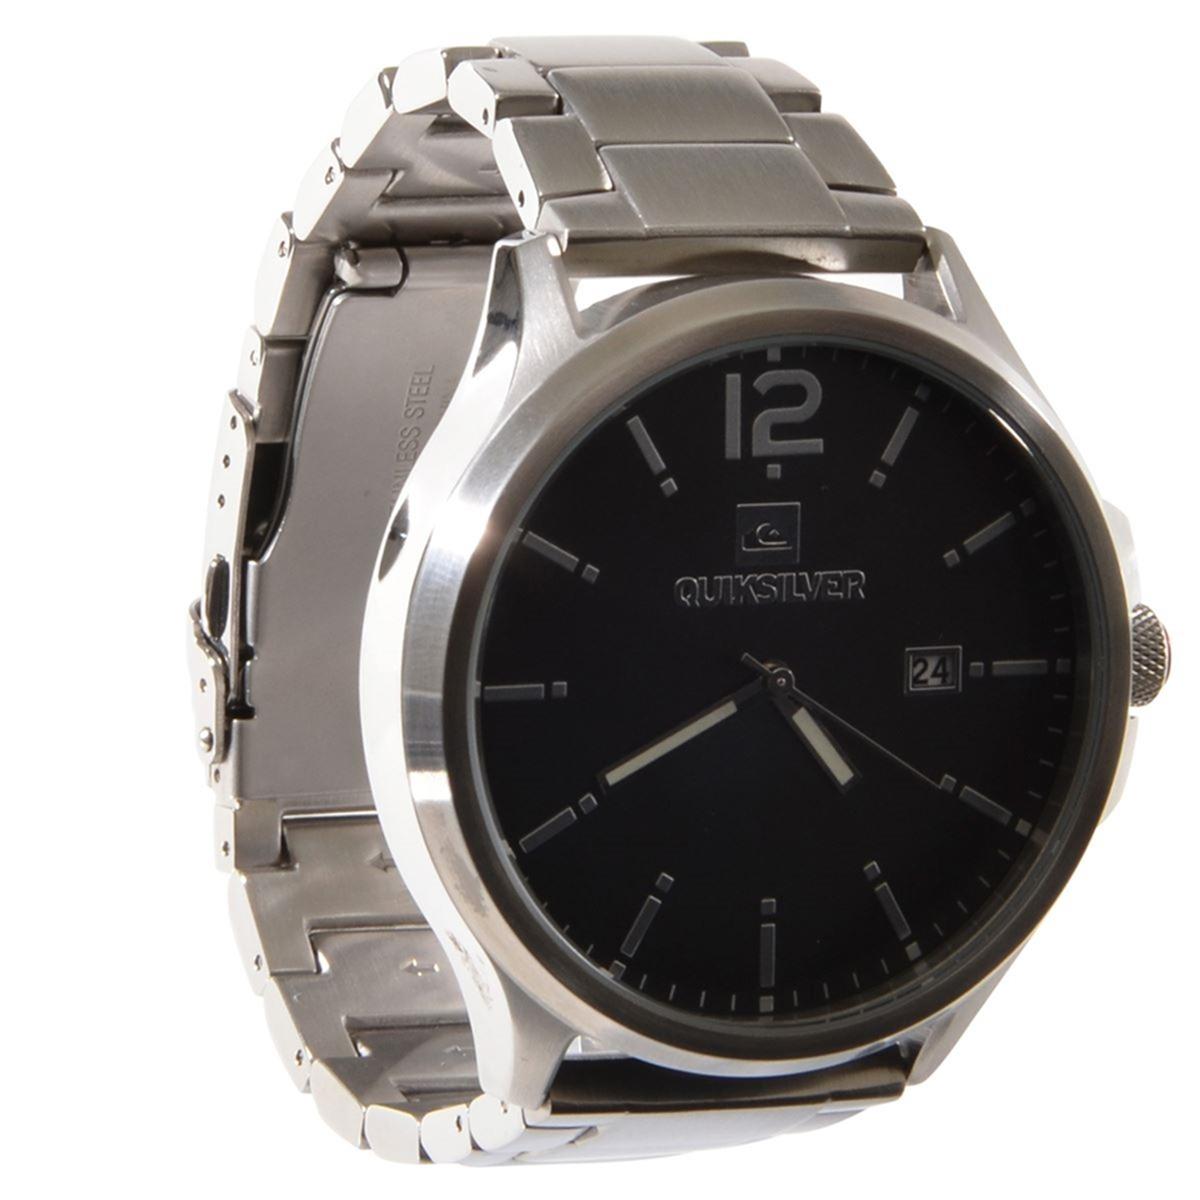 a2989a9750f relógio quiksilver beluka silver. Carregando zoom.